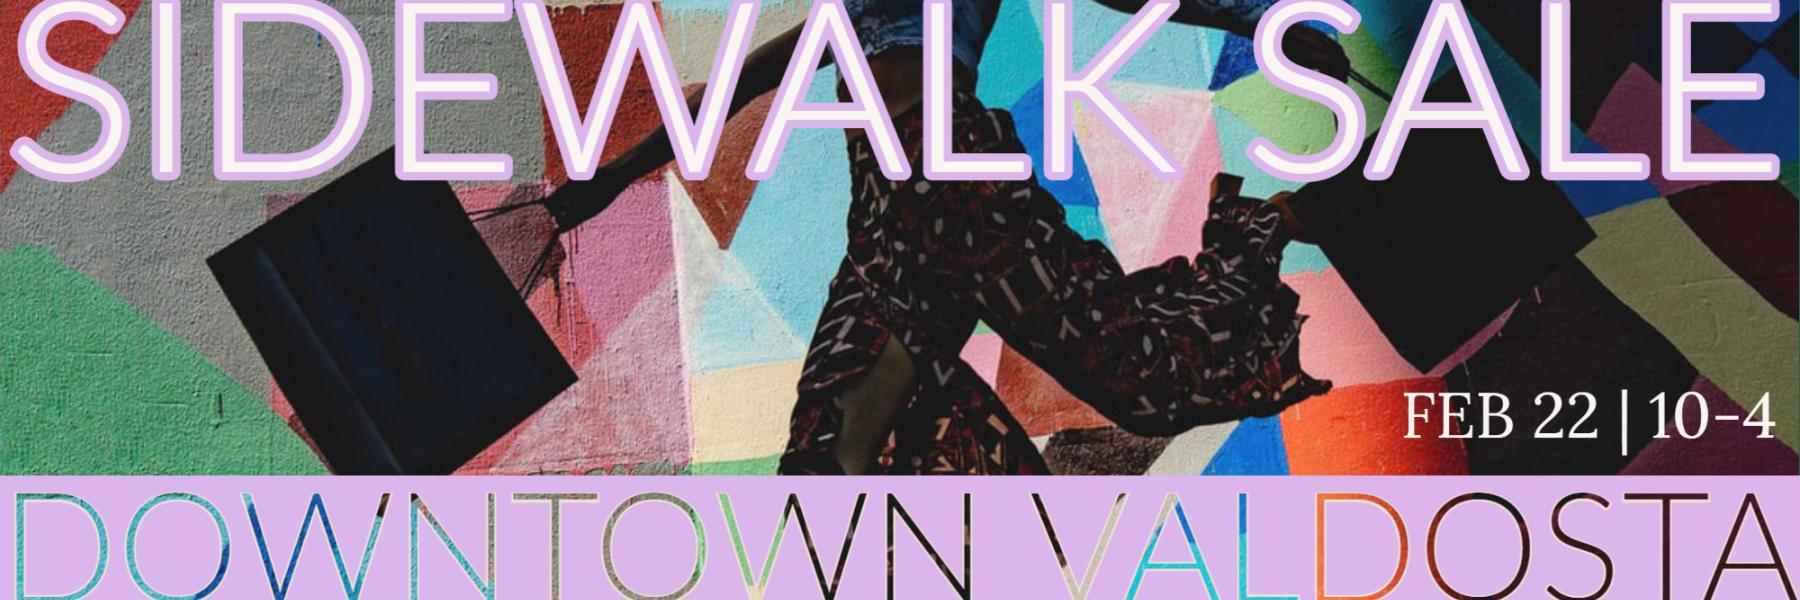 Sidewalk Sale in Downtown Valdosta on February 22nd 10-4